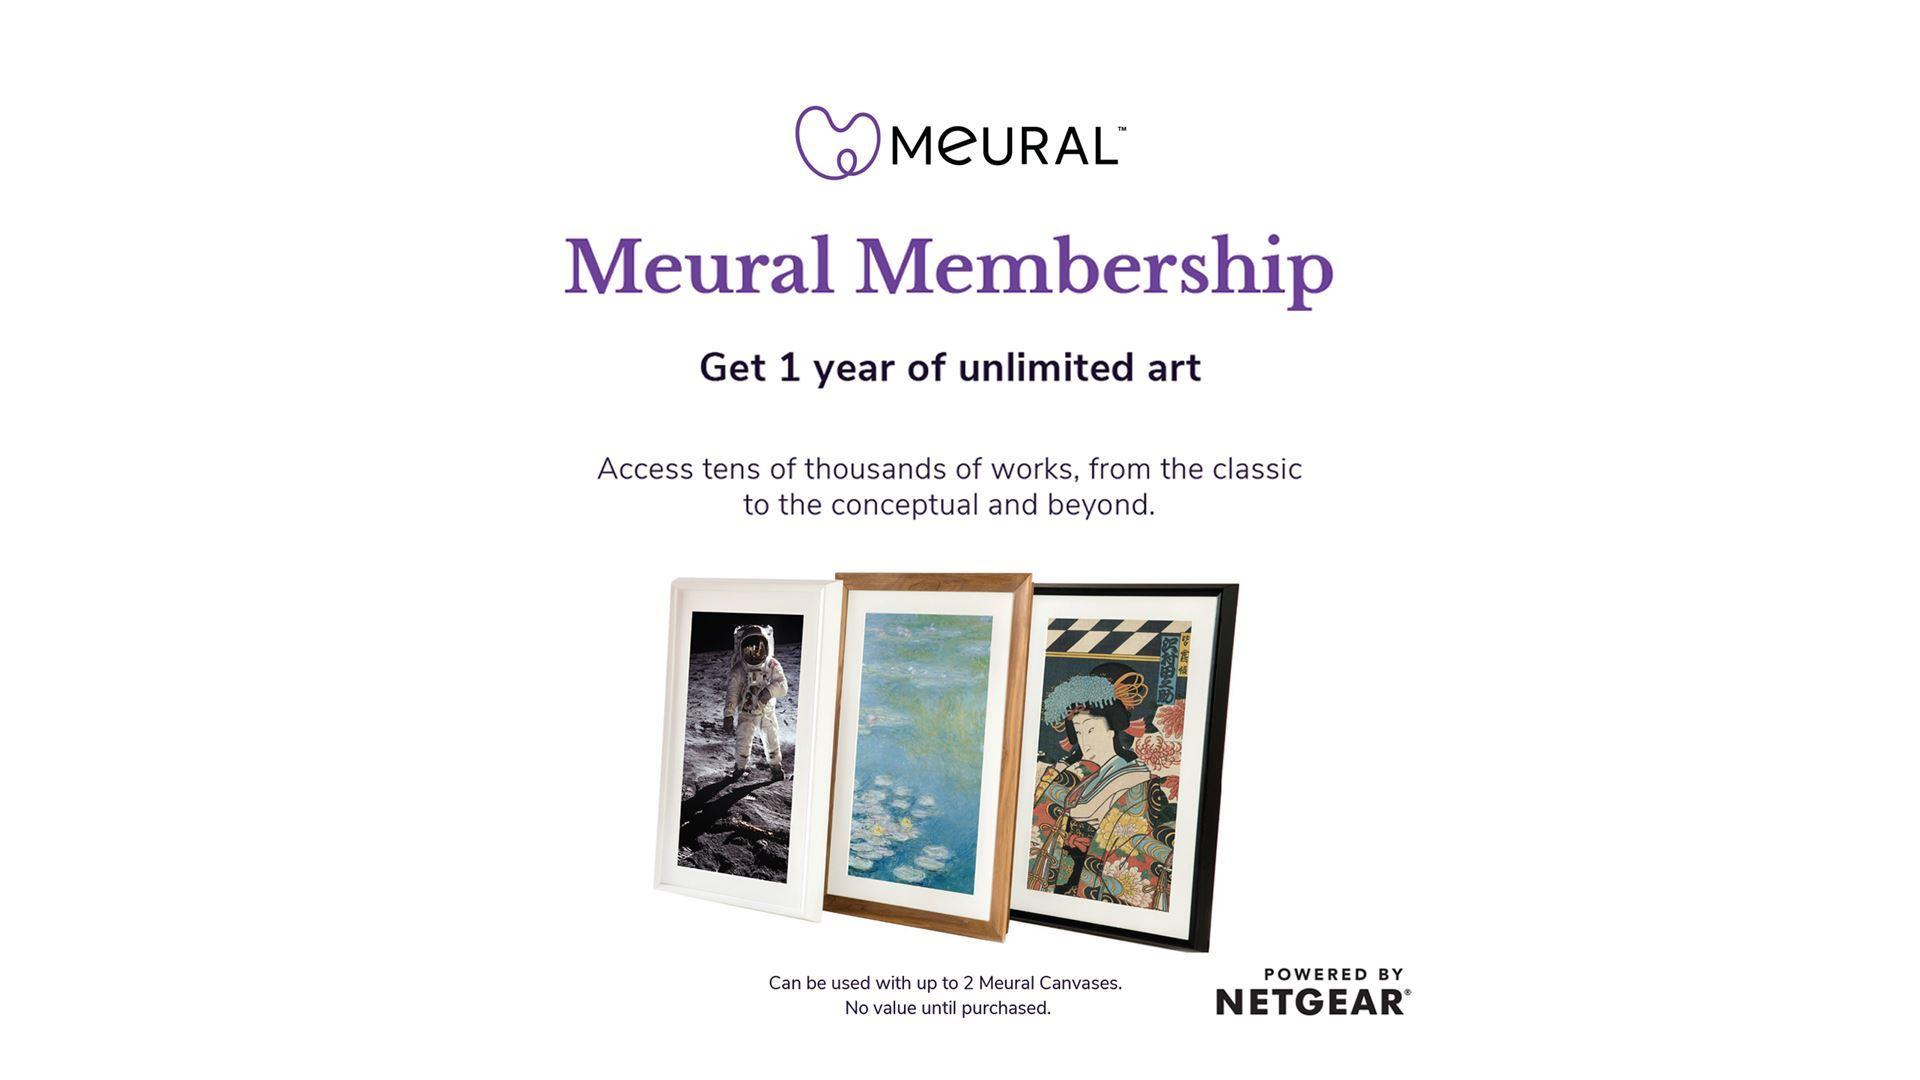 Meural Membership